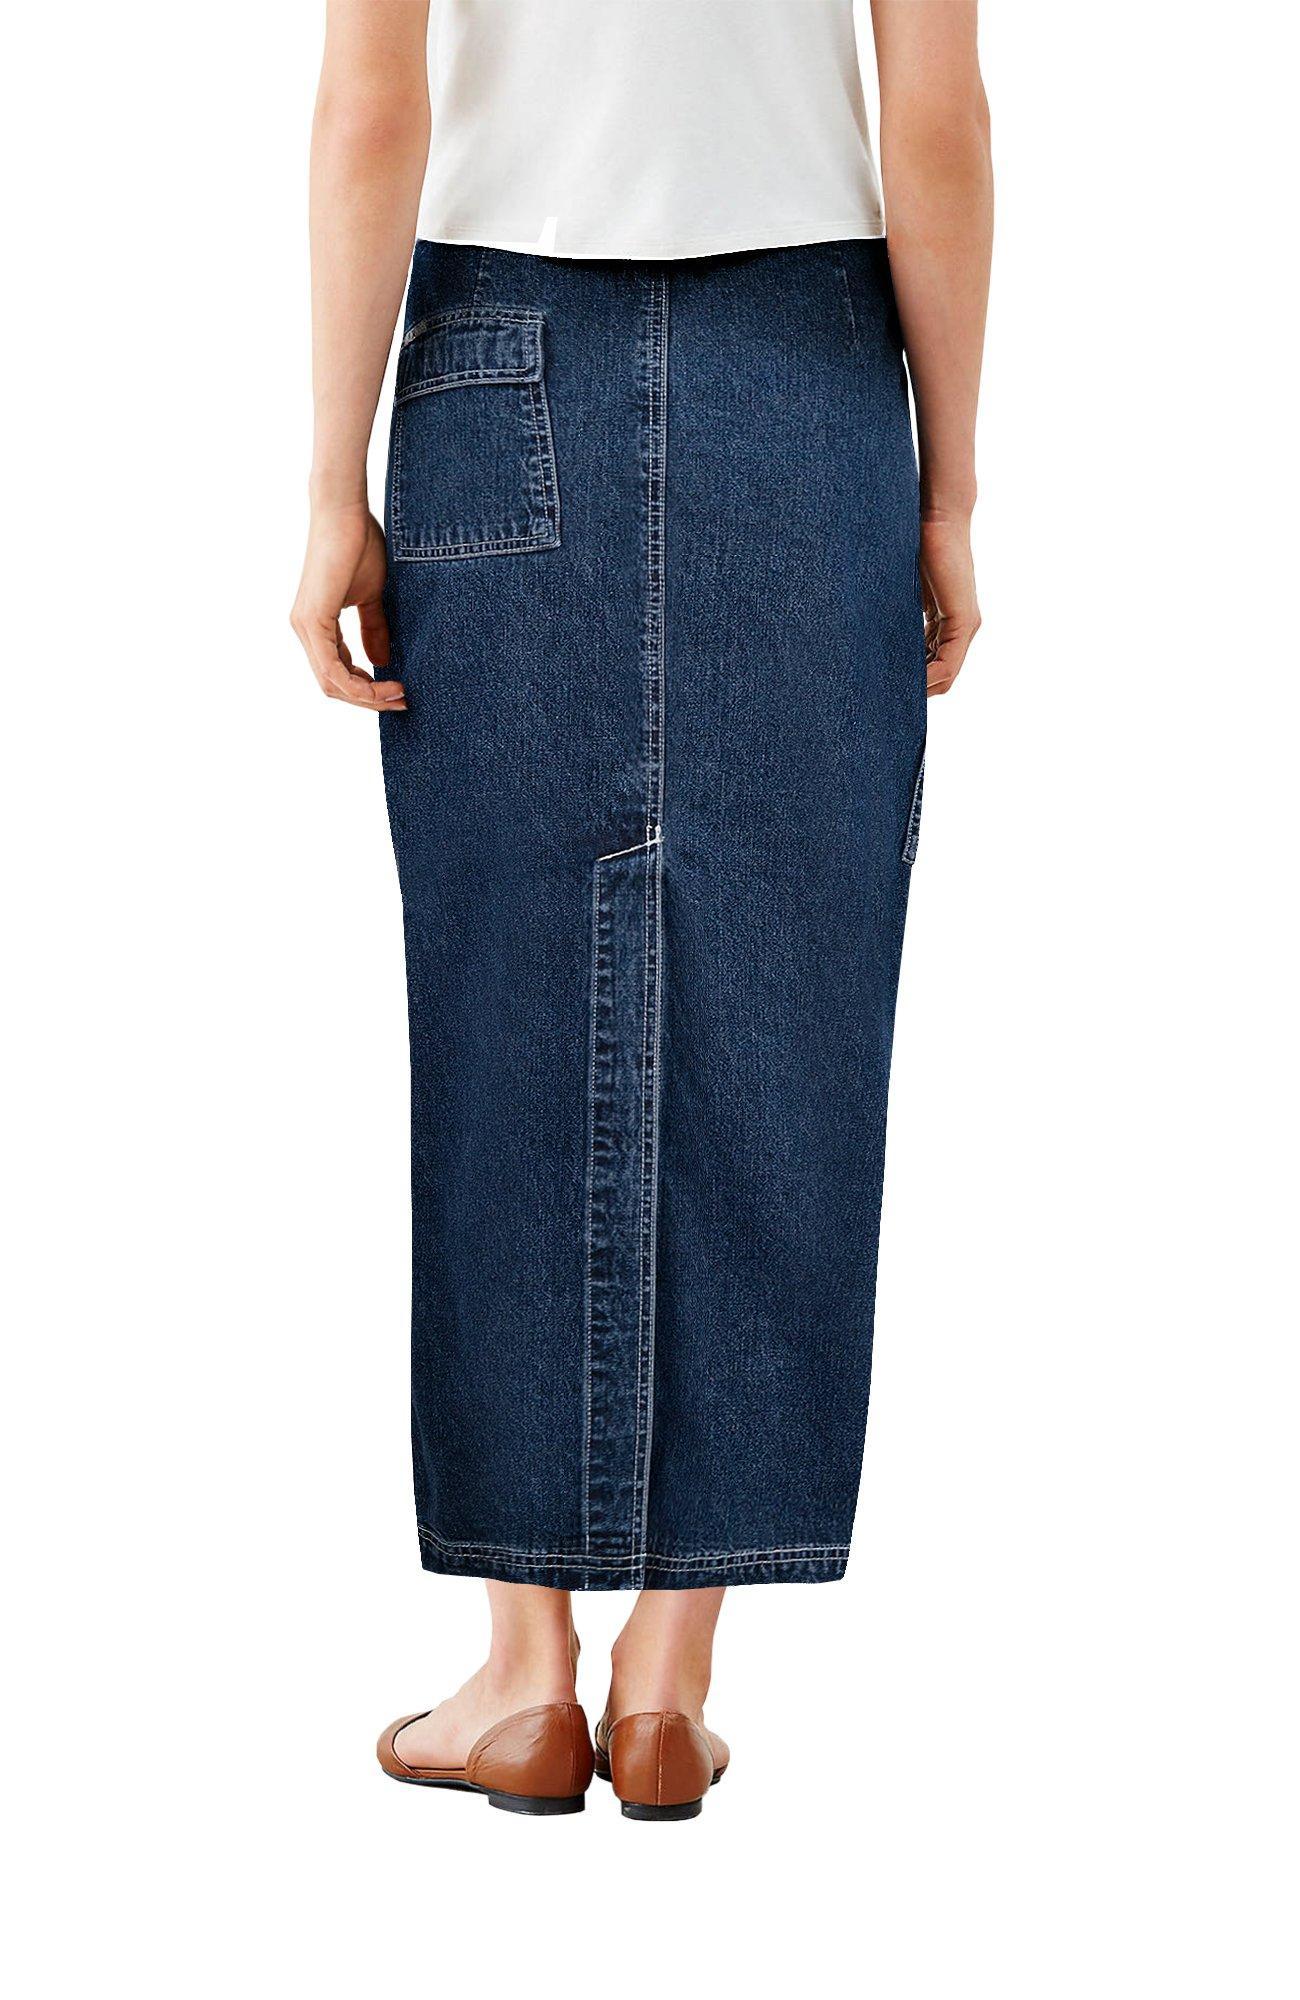 Womens Super Comfy Long Denim Maxi Skirt SK152708 Dark Wash 9 by HyBrid & Company (Image #2)